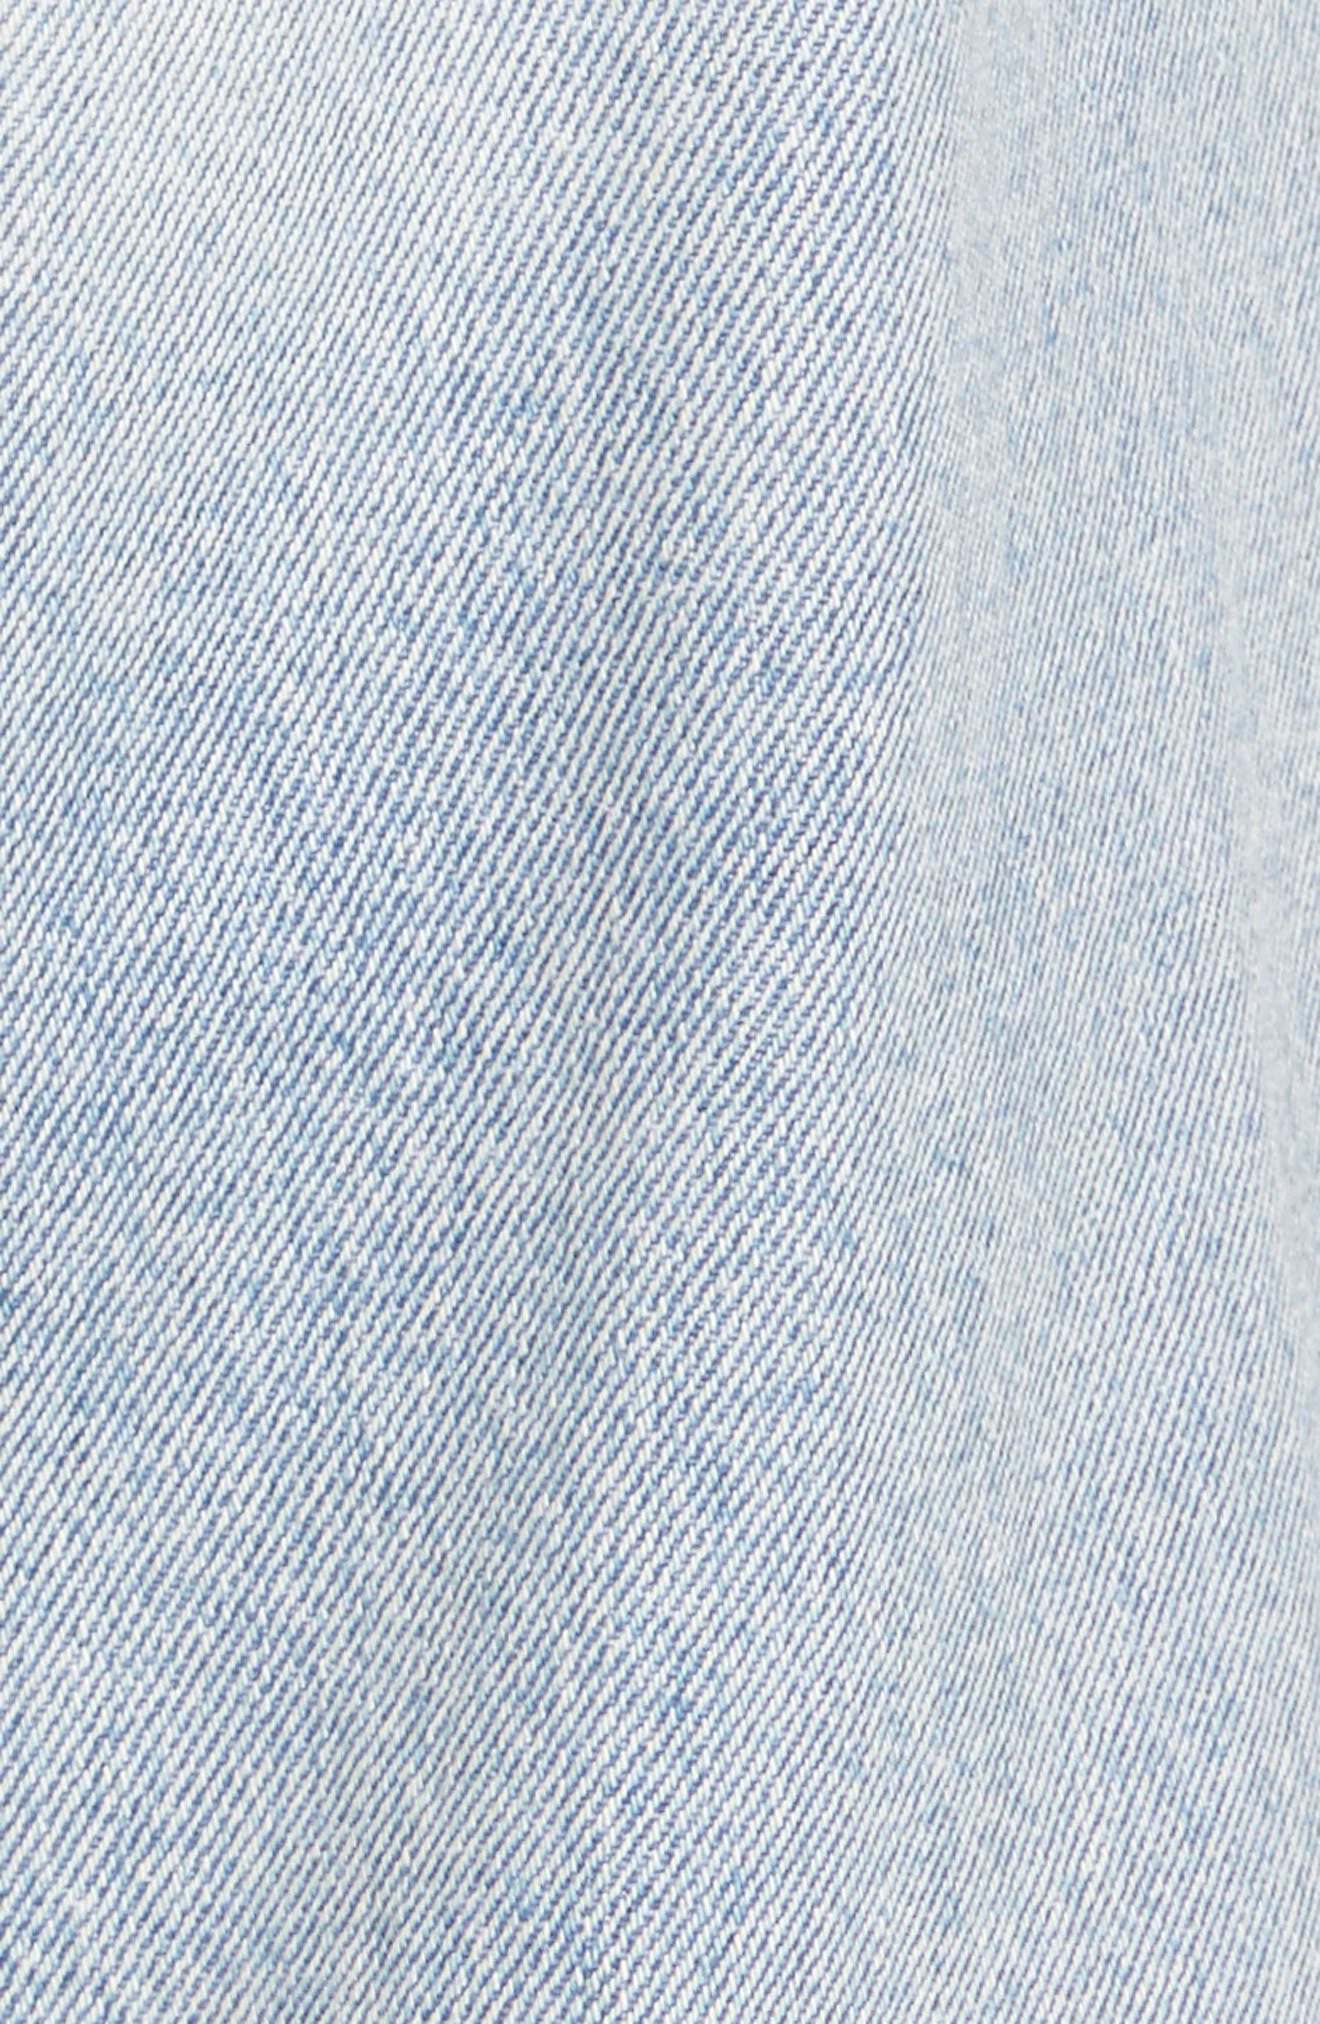 Ripped High Waist Straight Leg Jeans,                             Alternate thumbnail 5, color,                             457